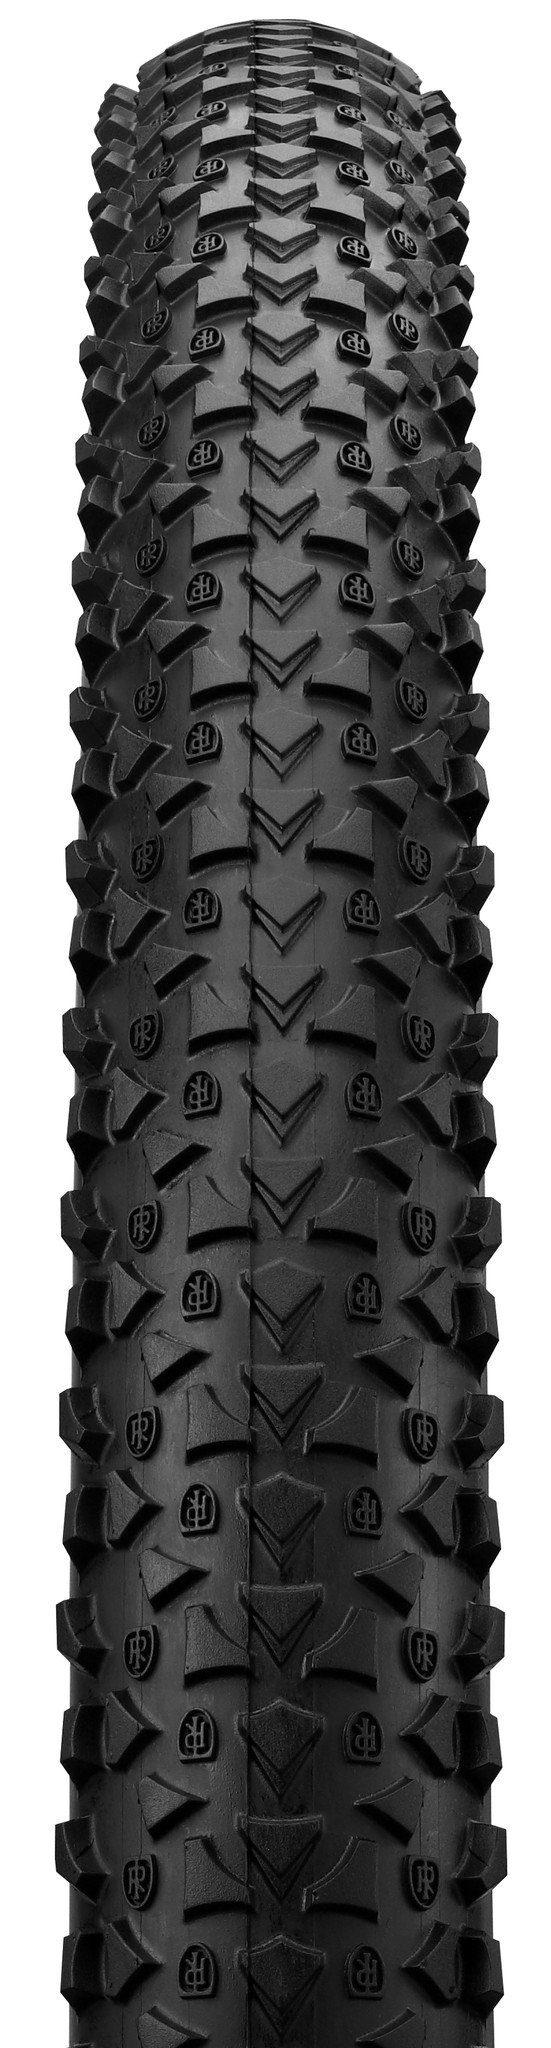 "Ritchey Fahrradreifen »Ritchey WCS Shield Reifen 27,5"" faltbar«"